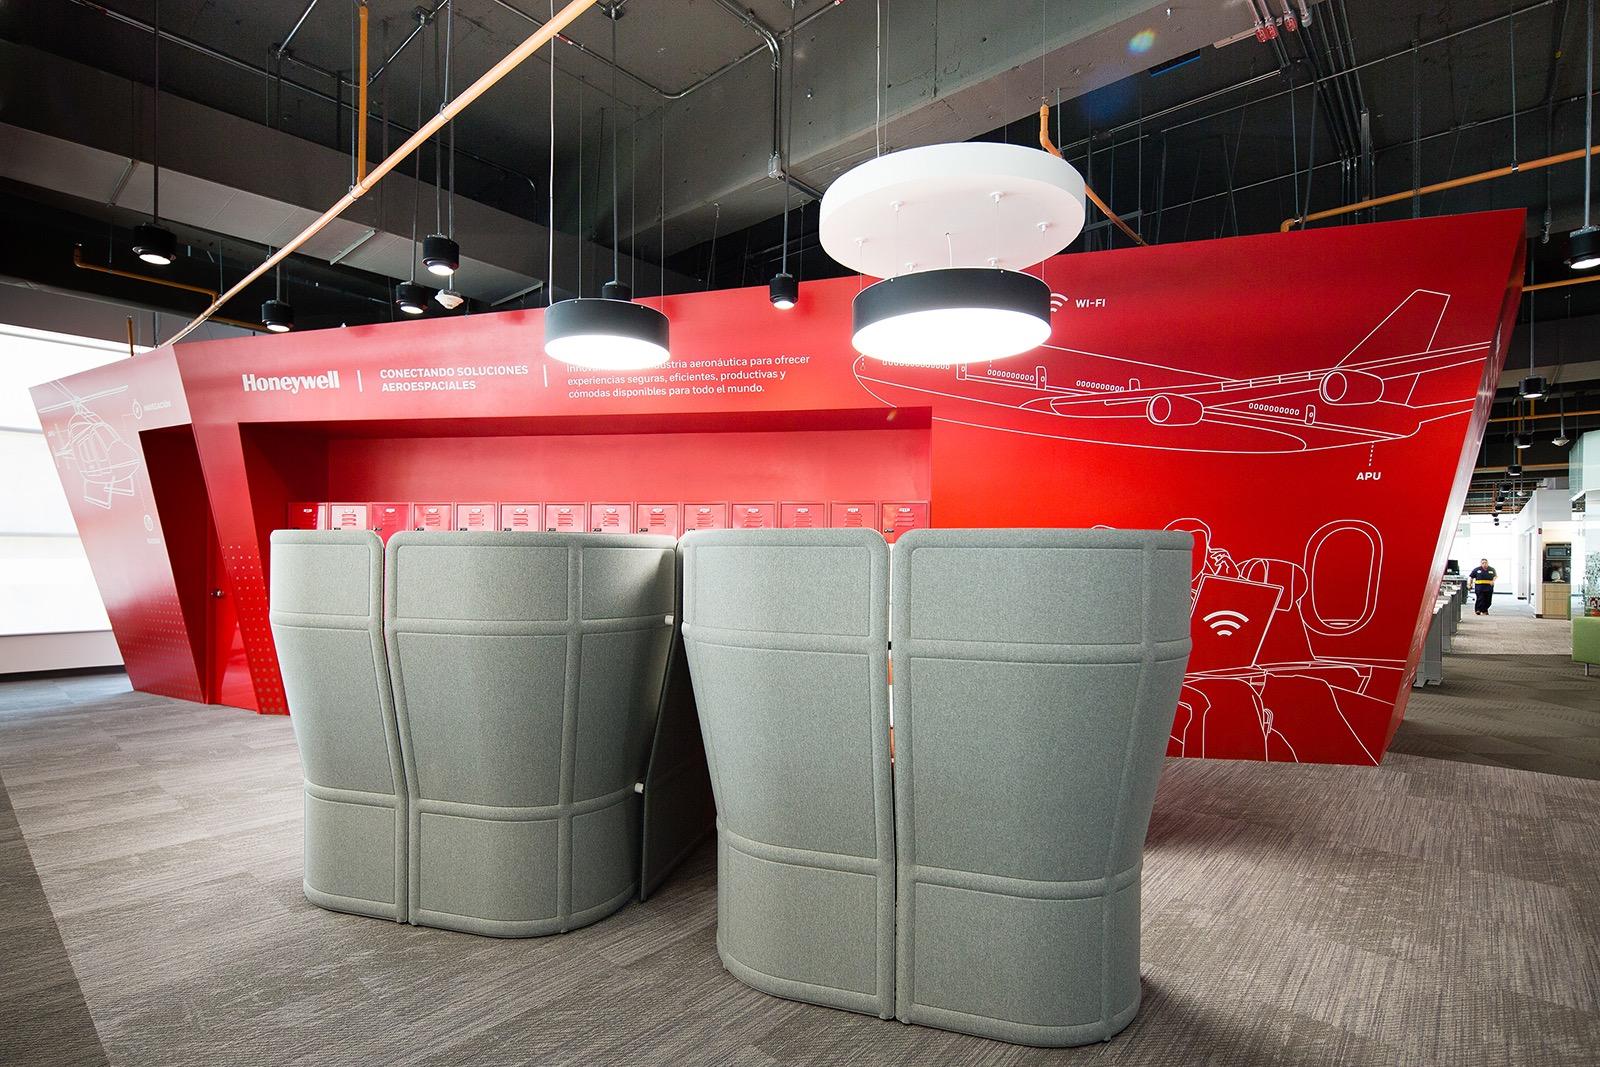 honeywell-technology-solutions-office-7